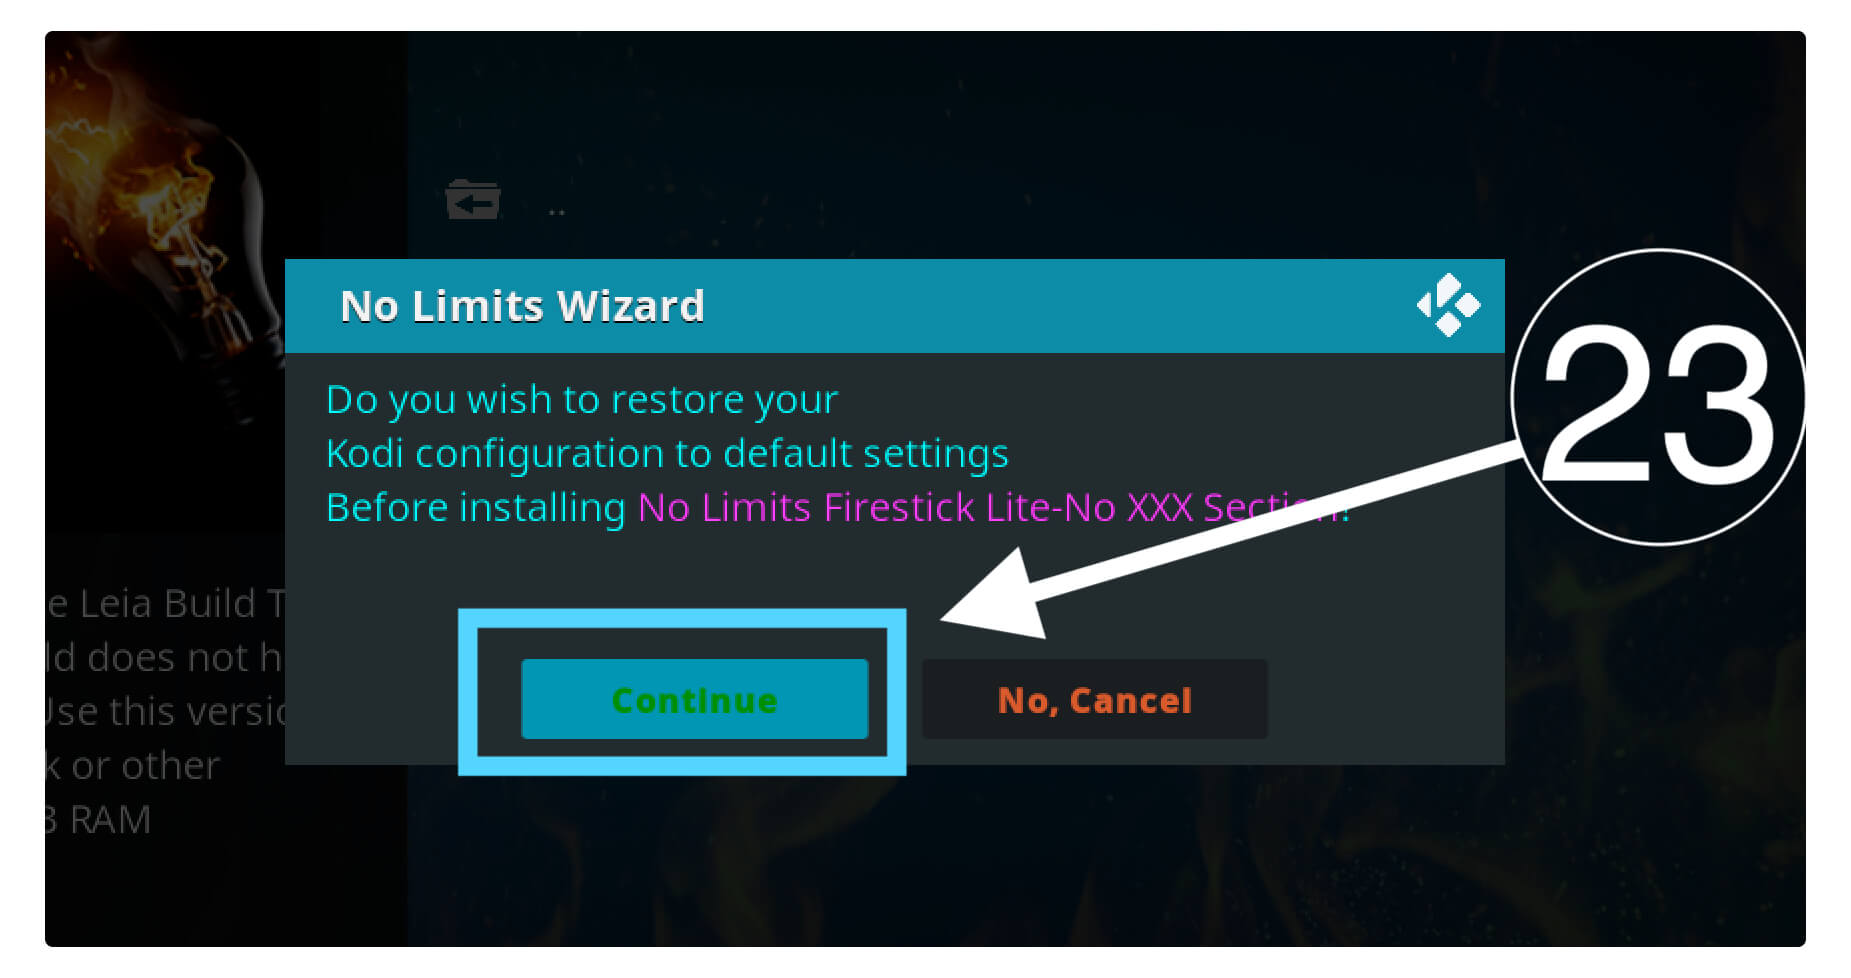 How-To-Use-No-Limits-Magic-Build-On-Kodi